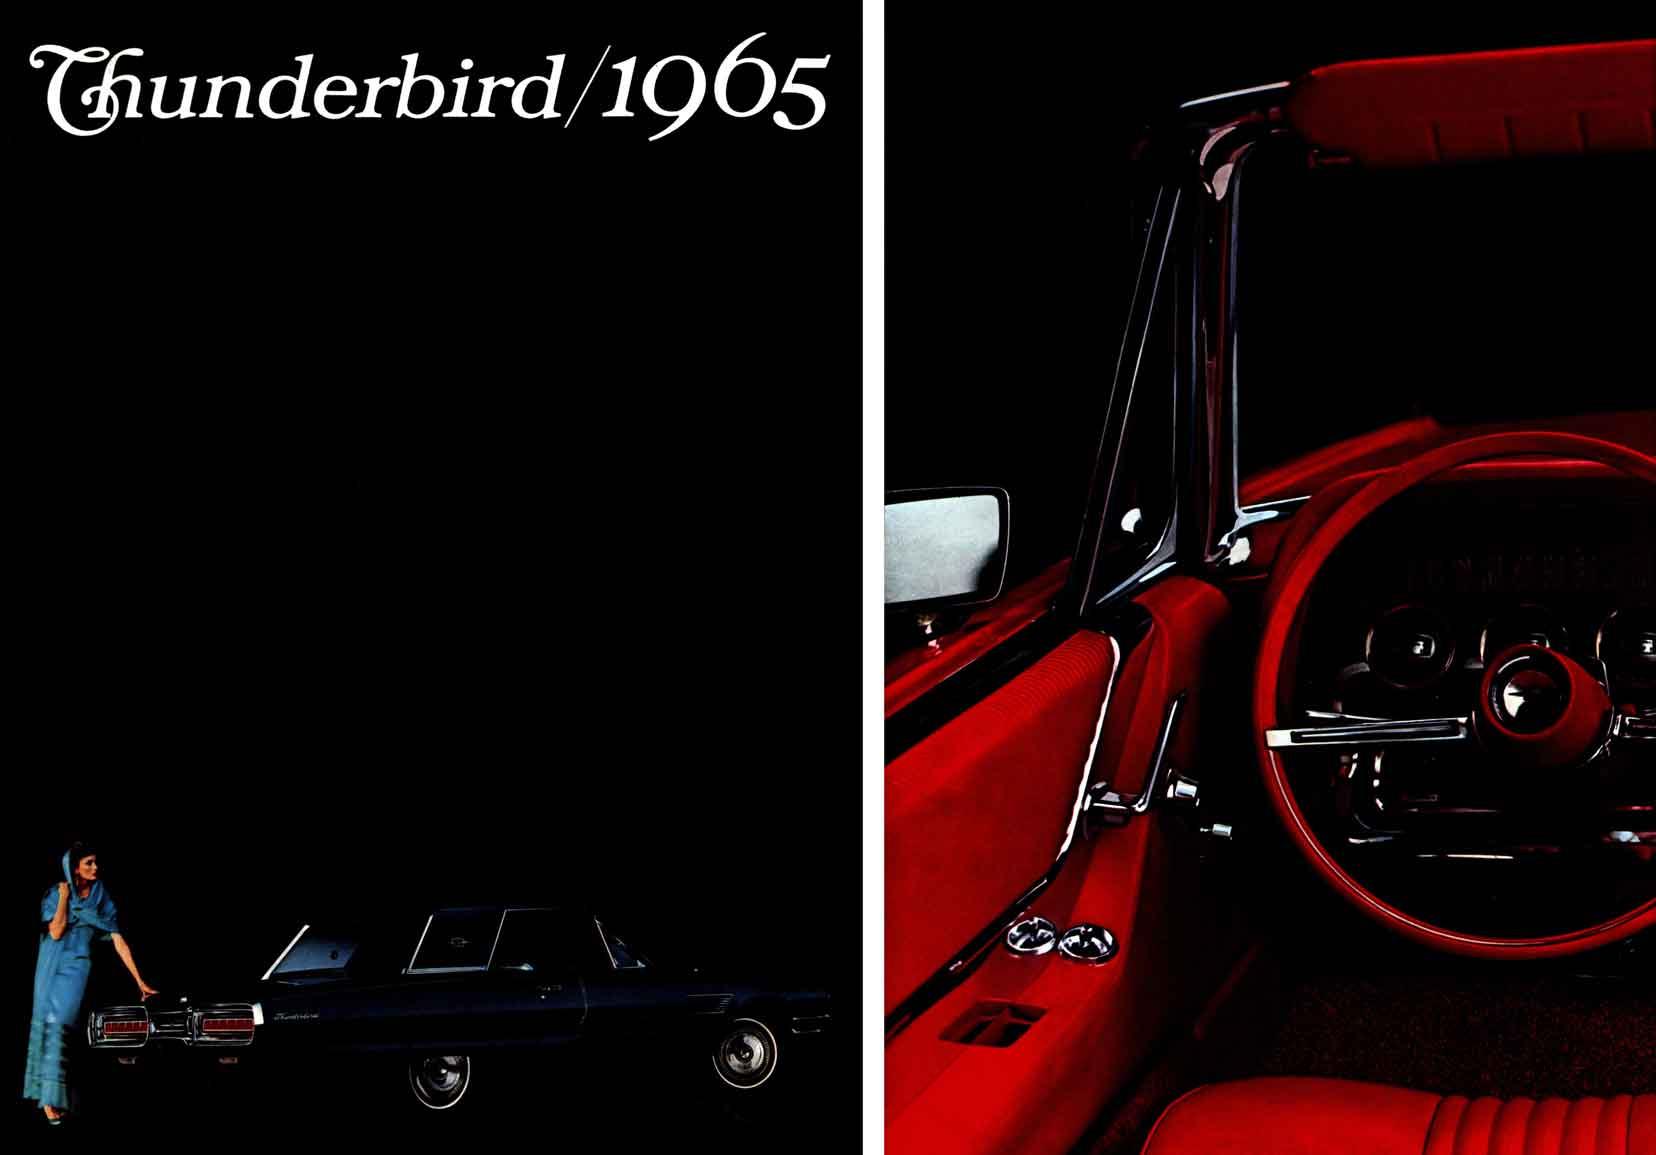 1965 Ford Thunderbird Hardtop.